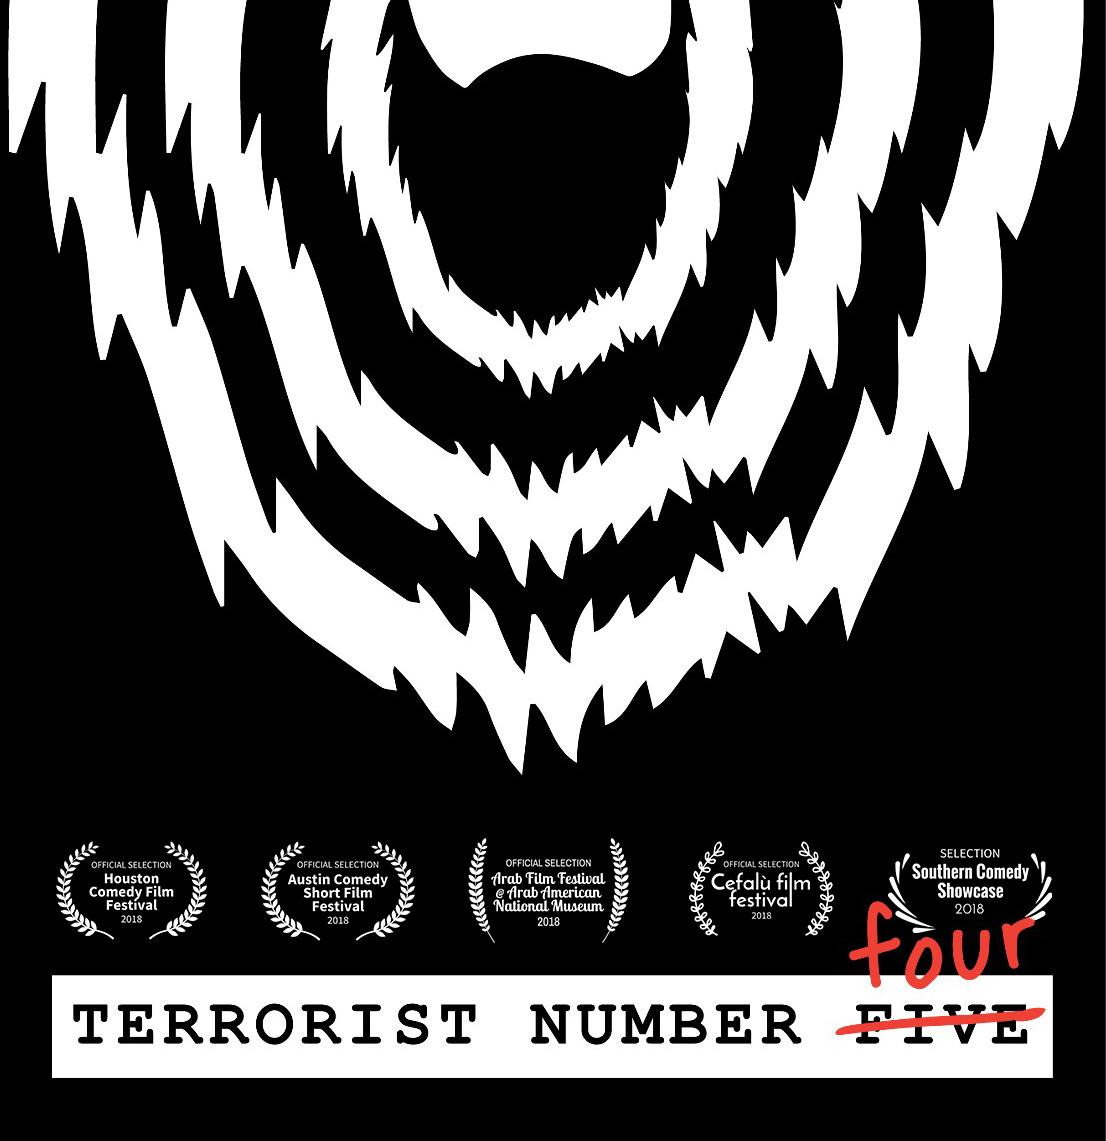 Terrorist number 4 directed by Bentley Brown & Nathan Dansky